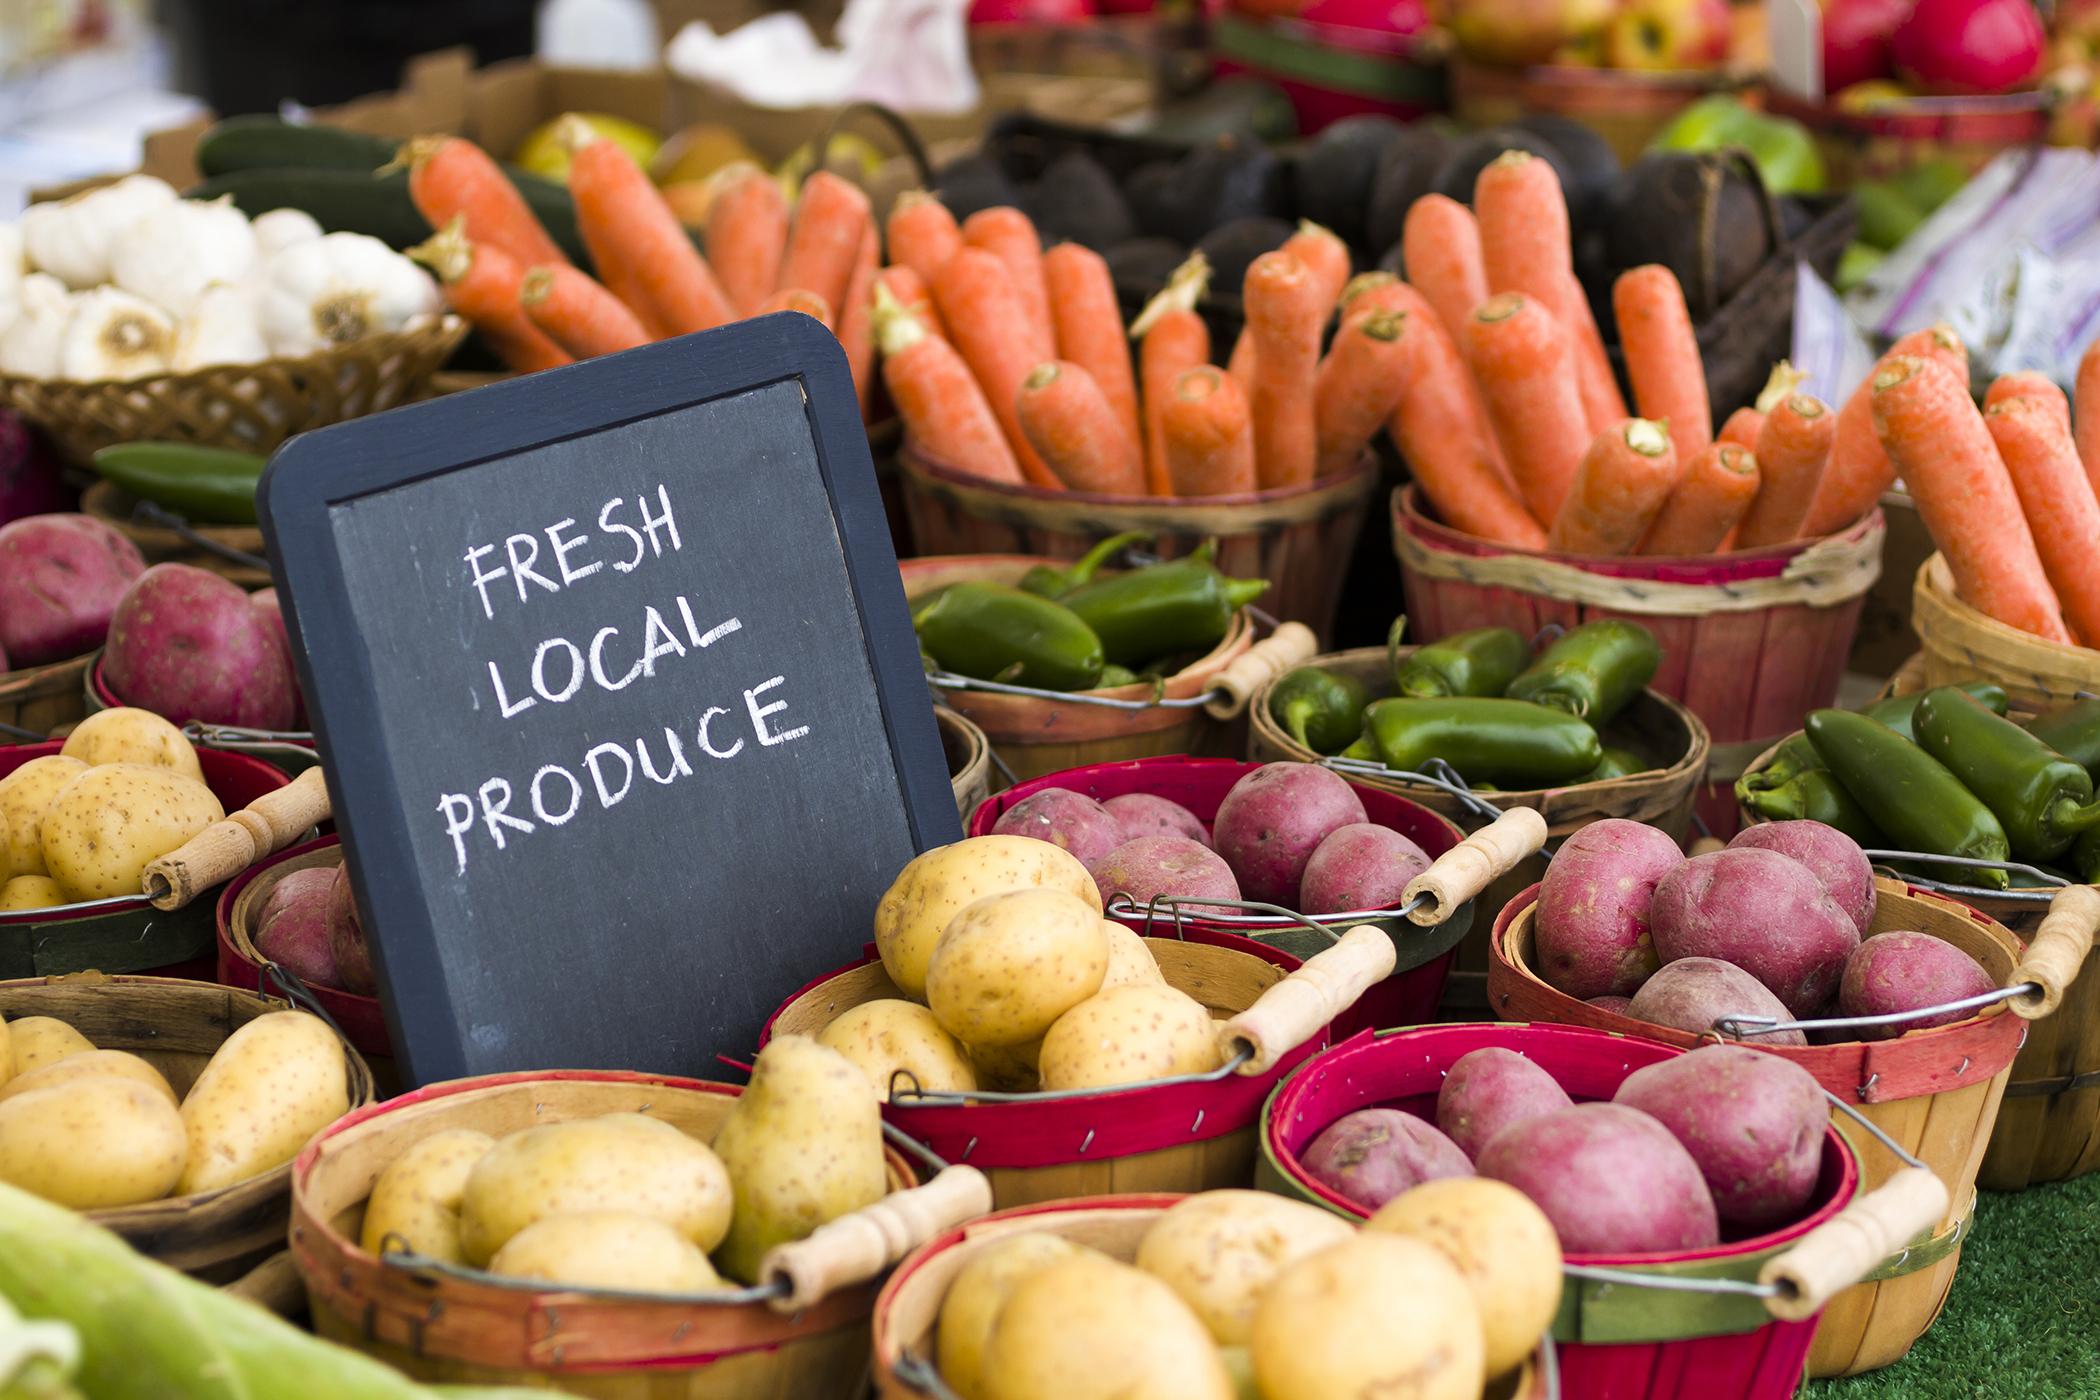 produce-farmers-market-vegetables.jpg